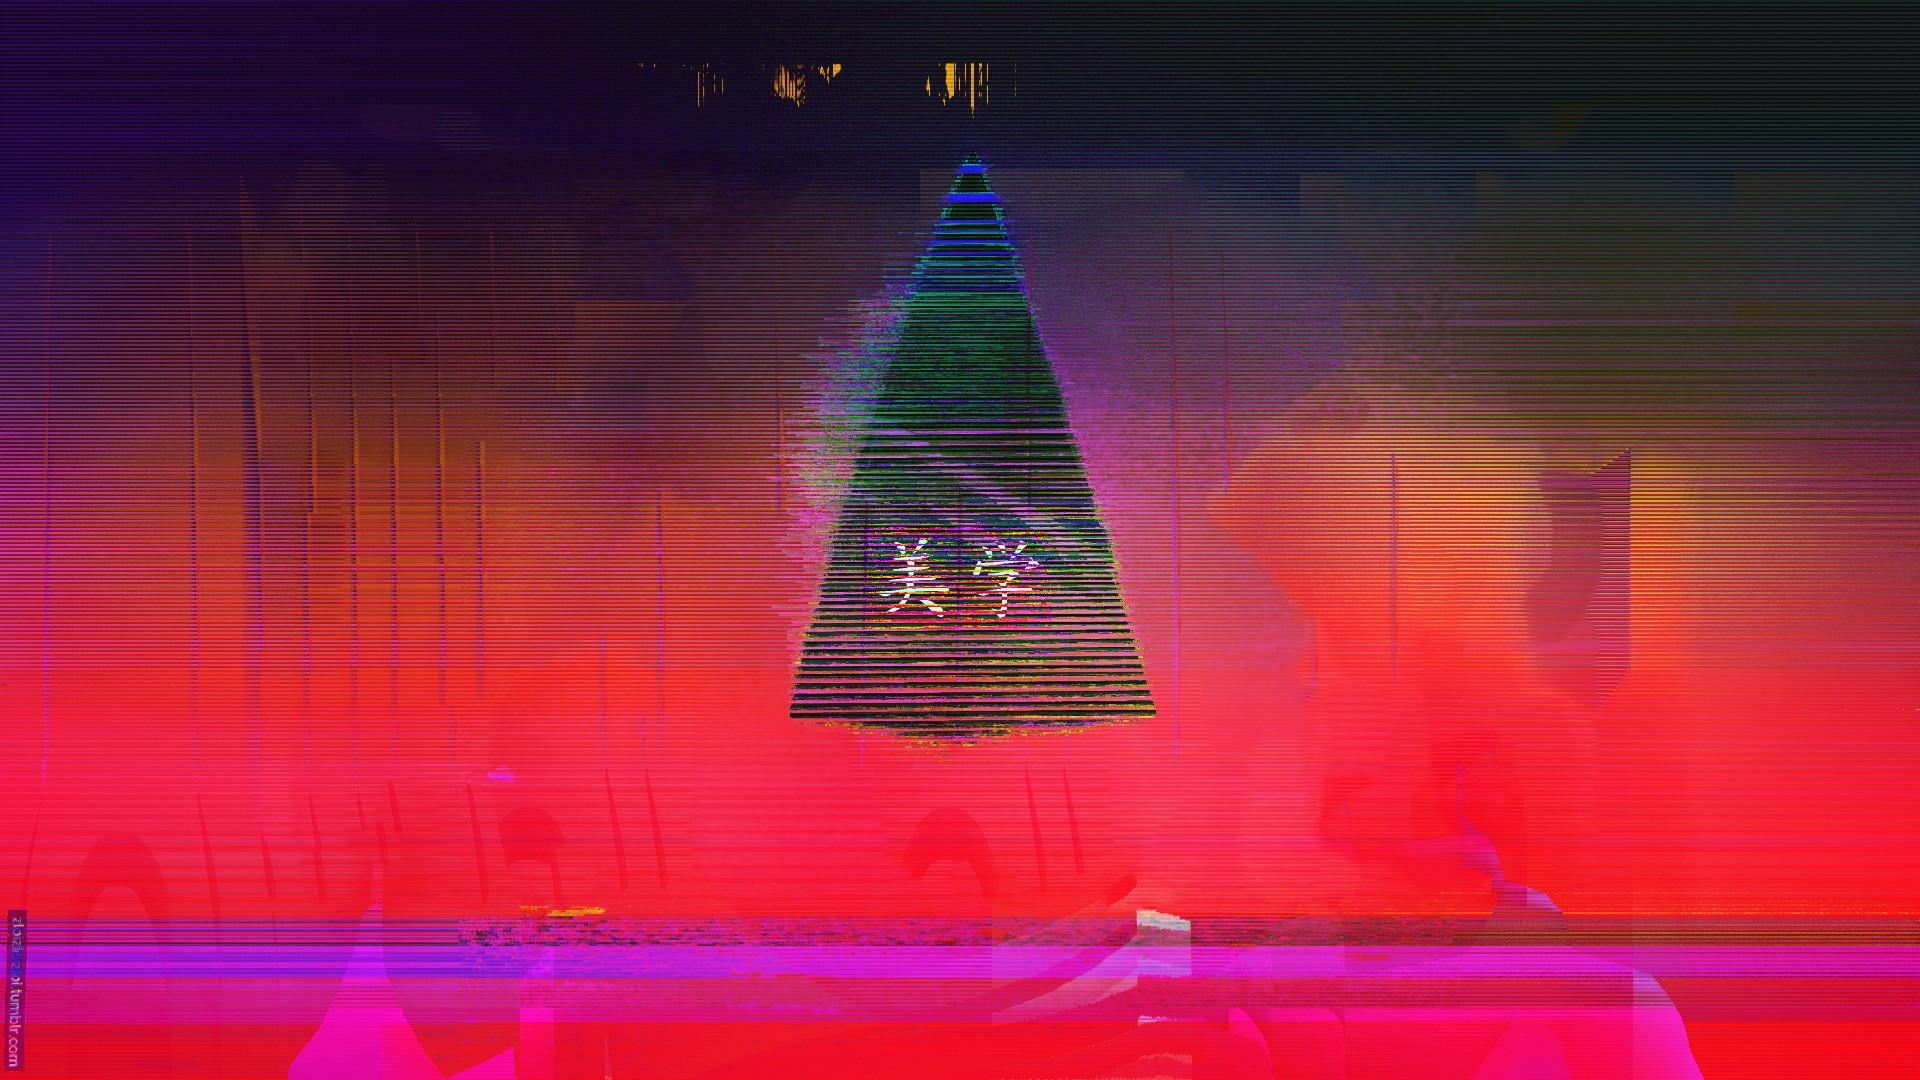 wallpaper 1920x1080 px abstract glitch art japan neon